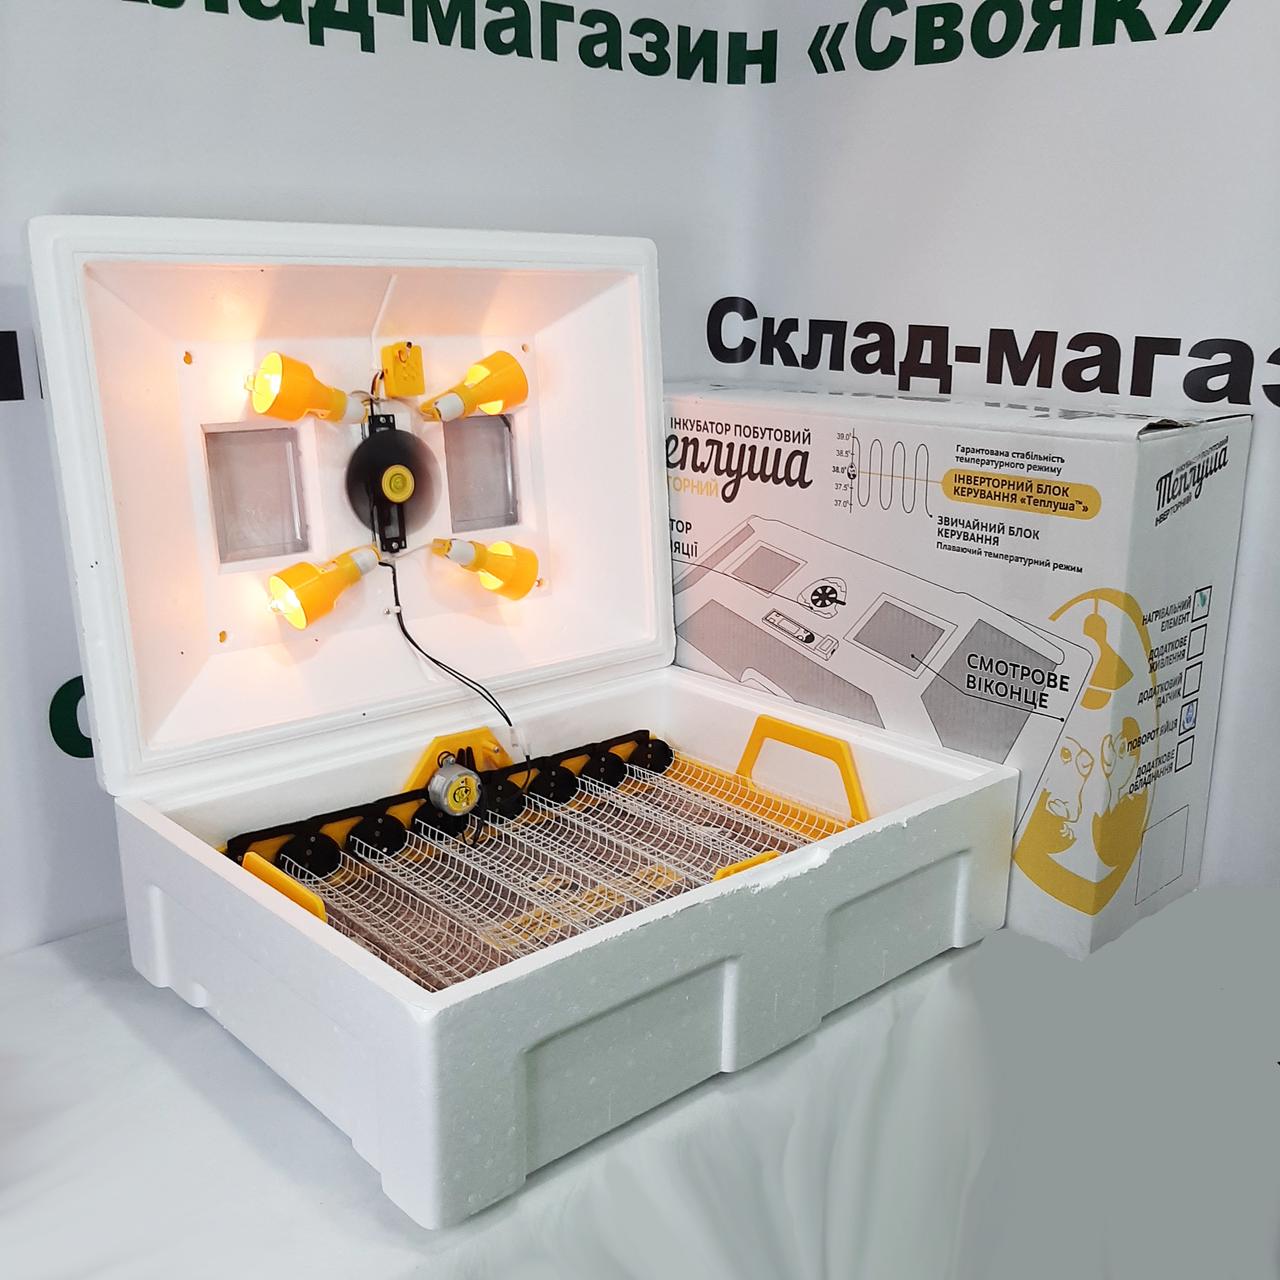 "Инкубатор ""Теплуша люкс"" 72 яйца (Автоматический переворот). Цифровой термометр. Для всех видов птиц"